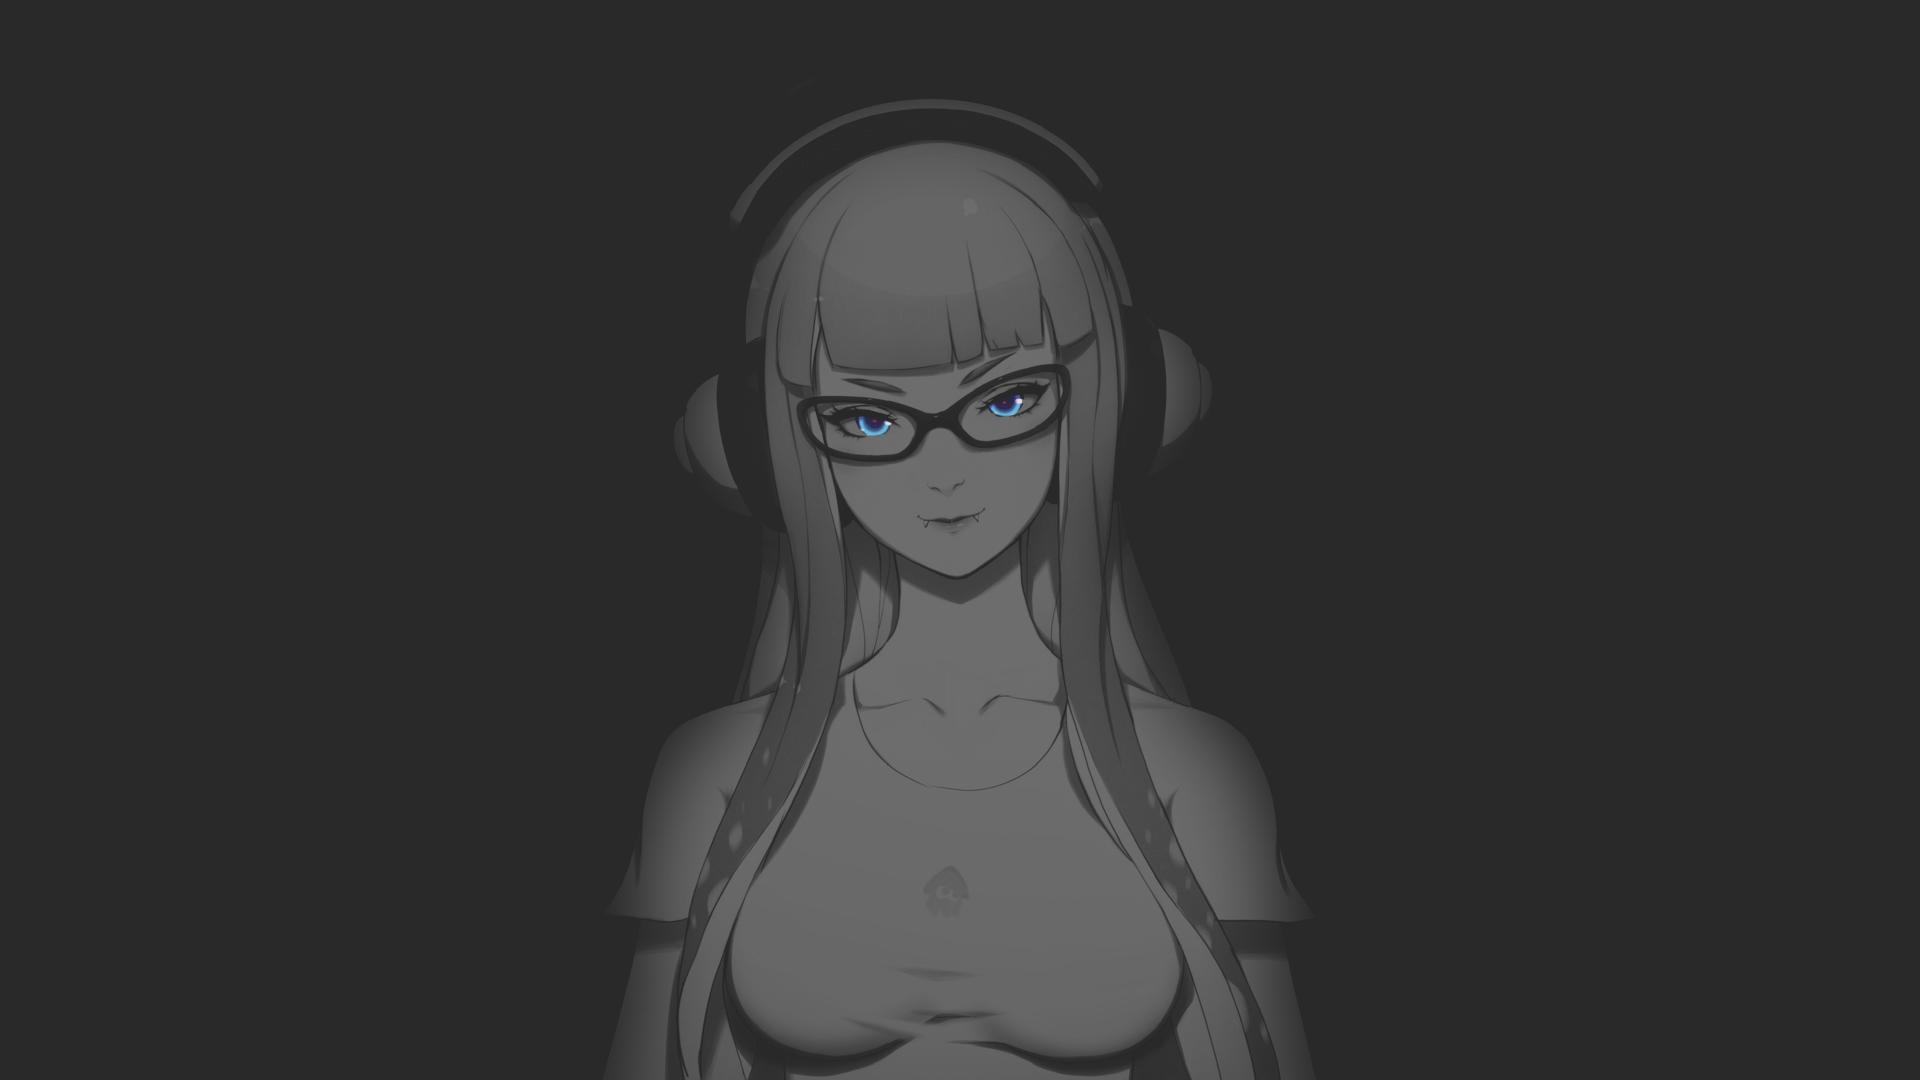 Anime 1920x1080 Zeronis dark background anime anime girls boobs blue eyes headphones illustration night selective coloring Splatoon